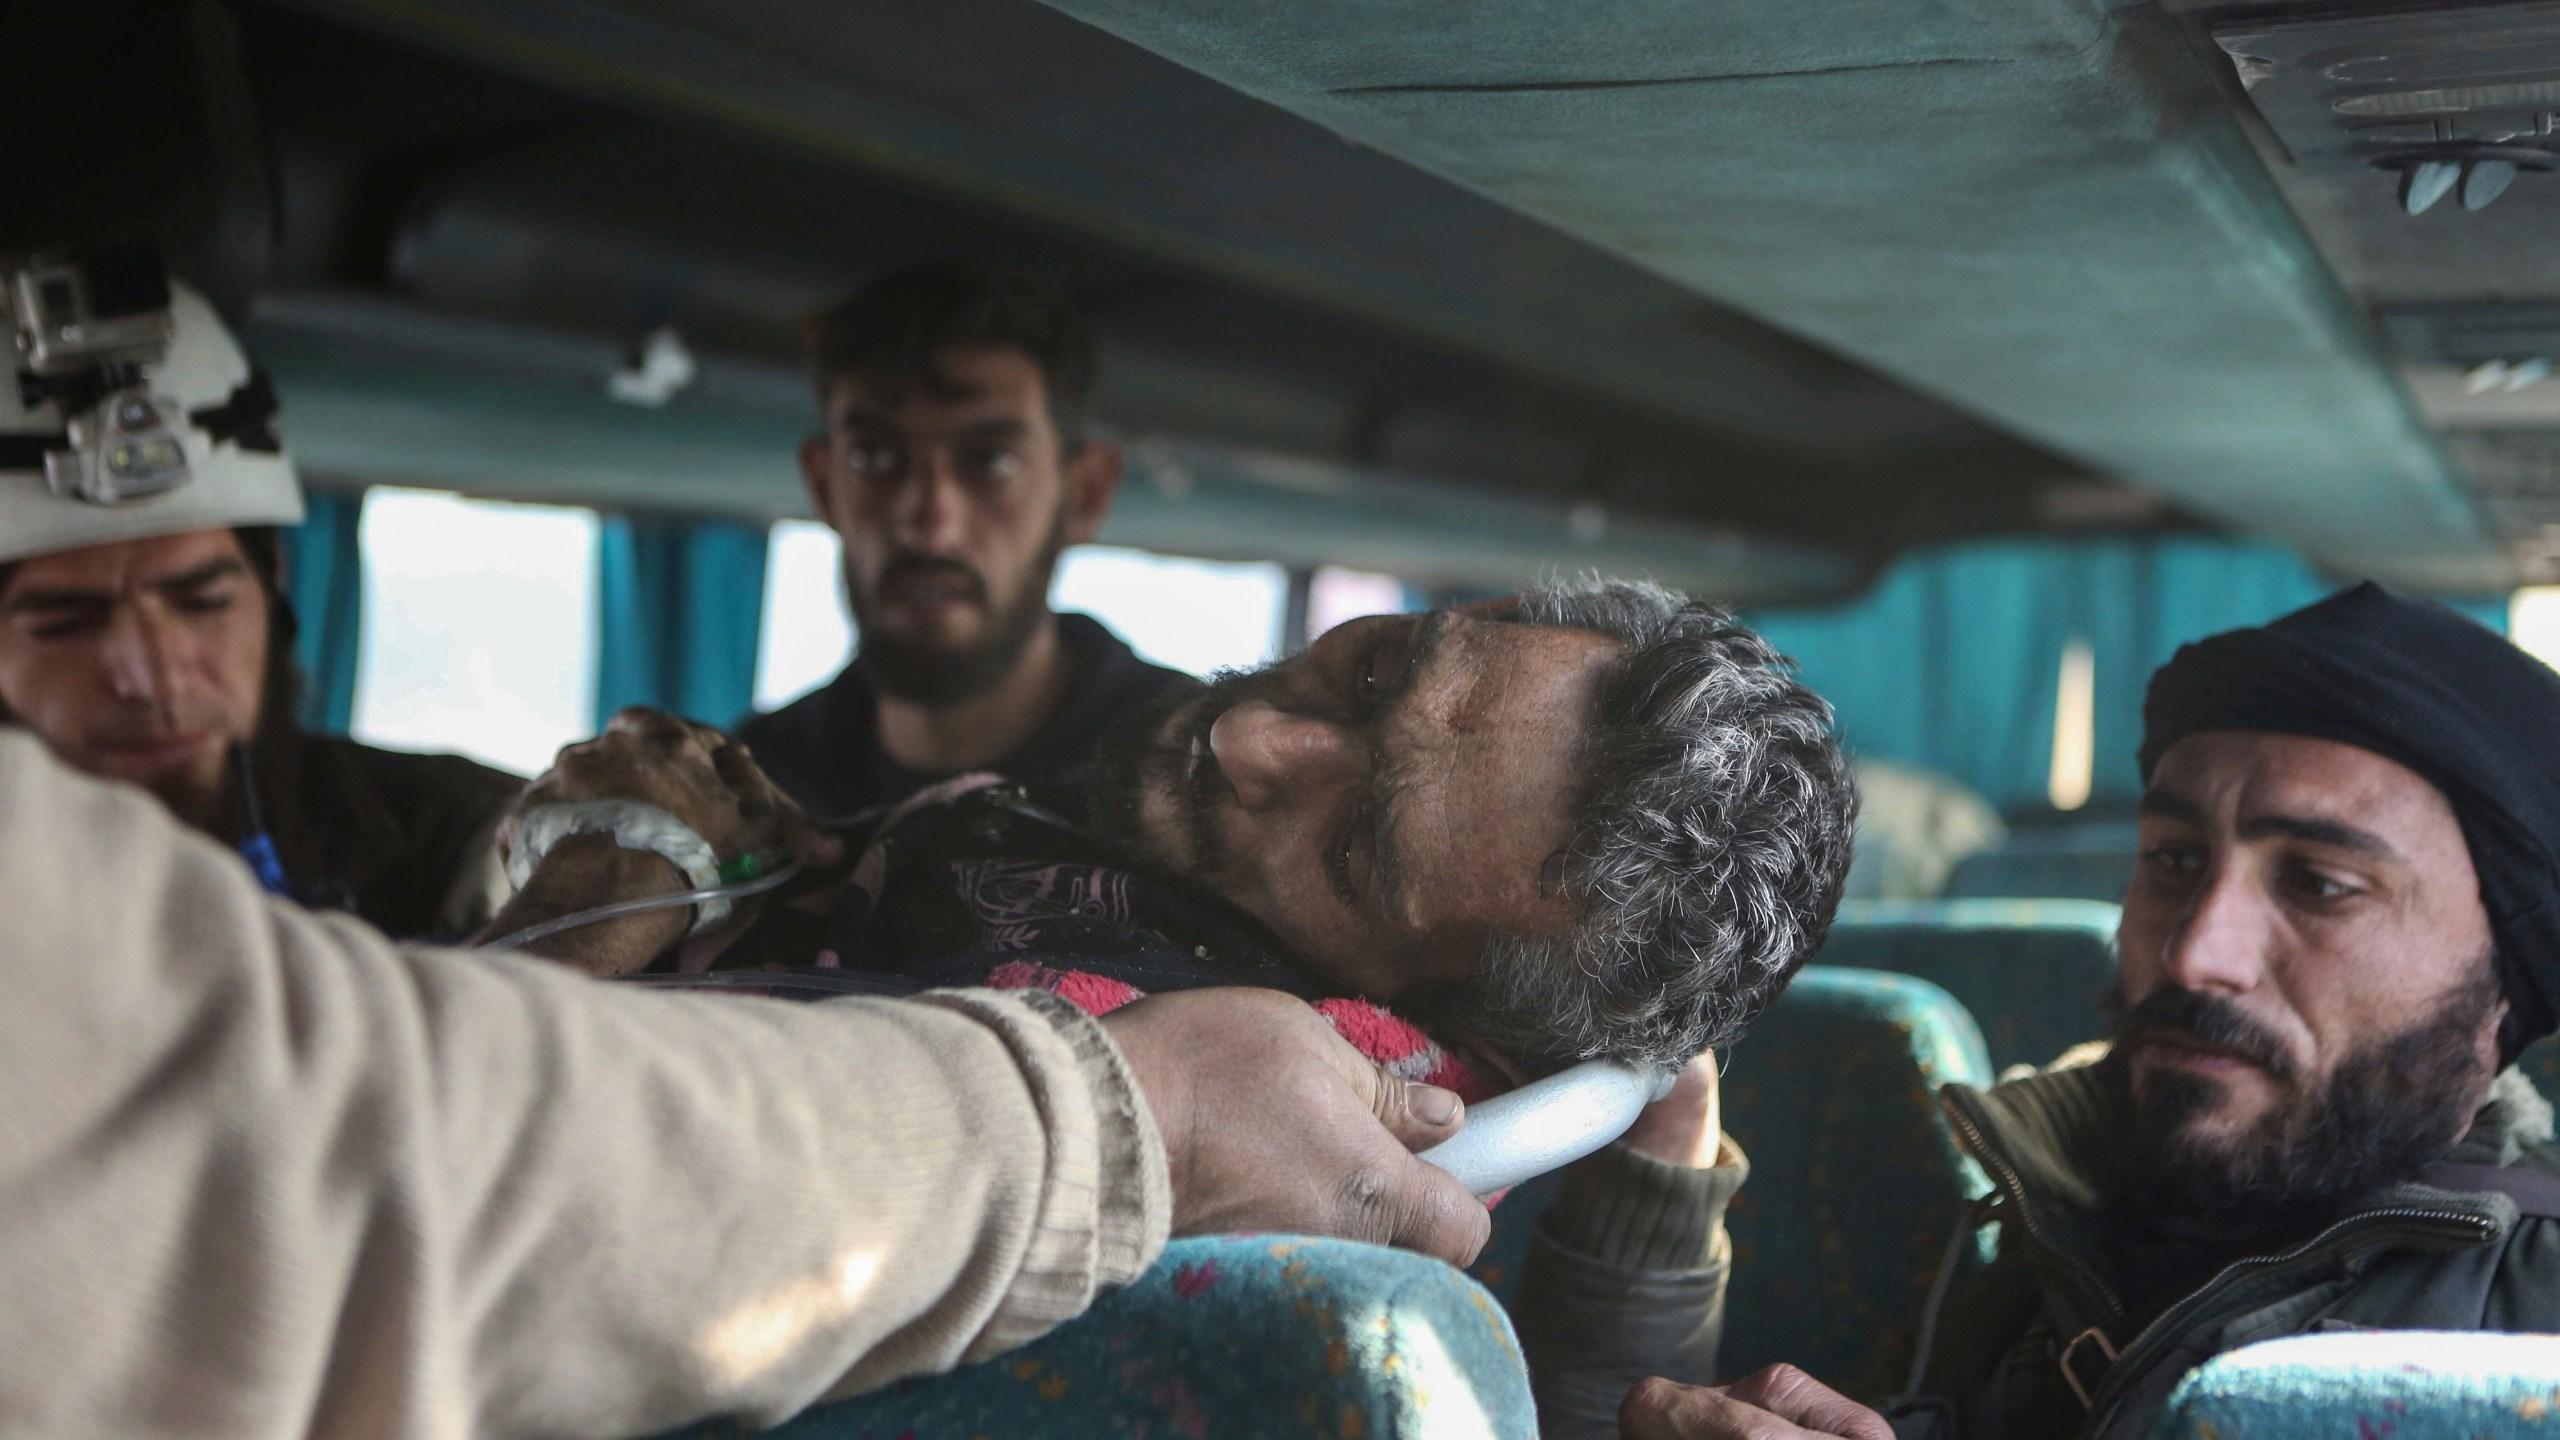 Syria Russia Turkey 12202016 AP Photo_257426